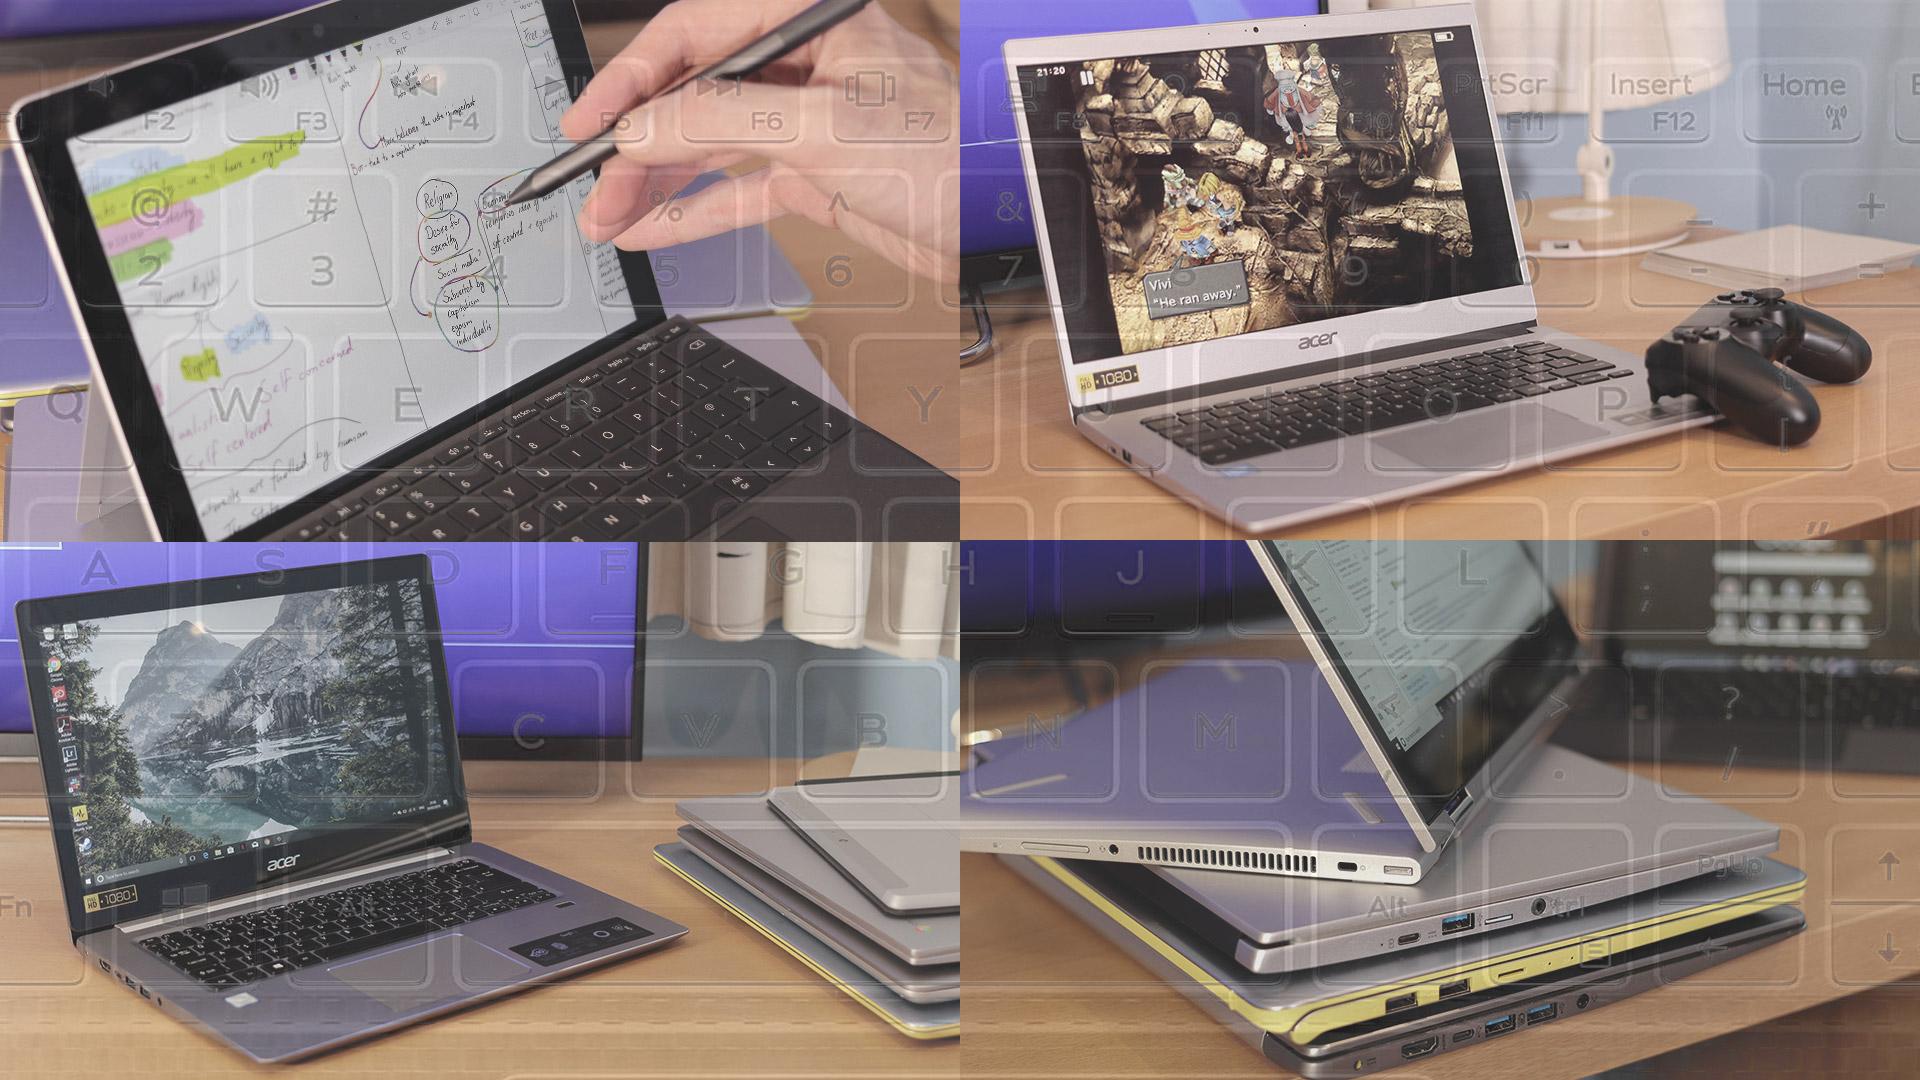 Best budget laptop 2020: great cheap Windows laptops tested